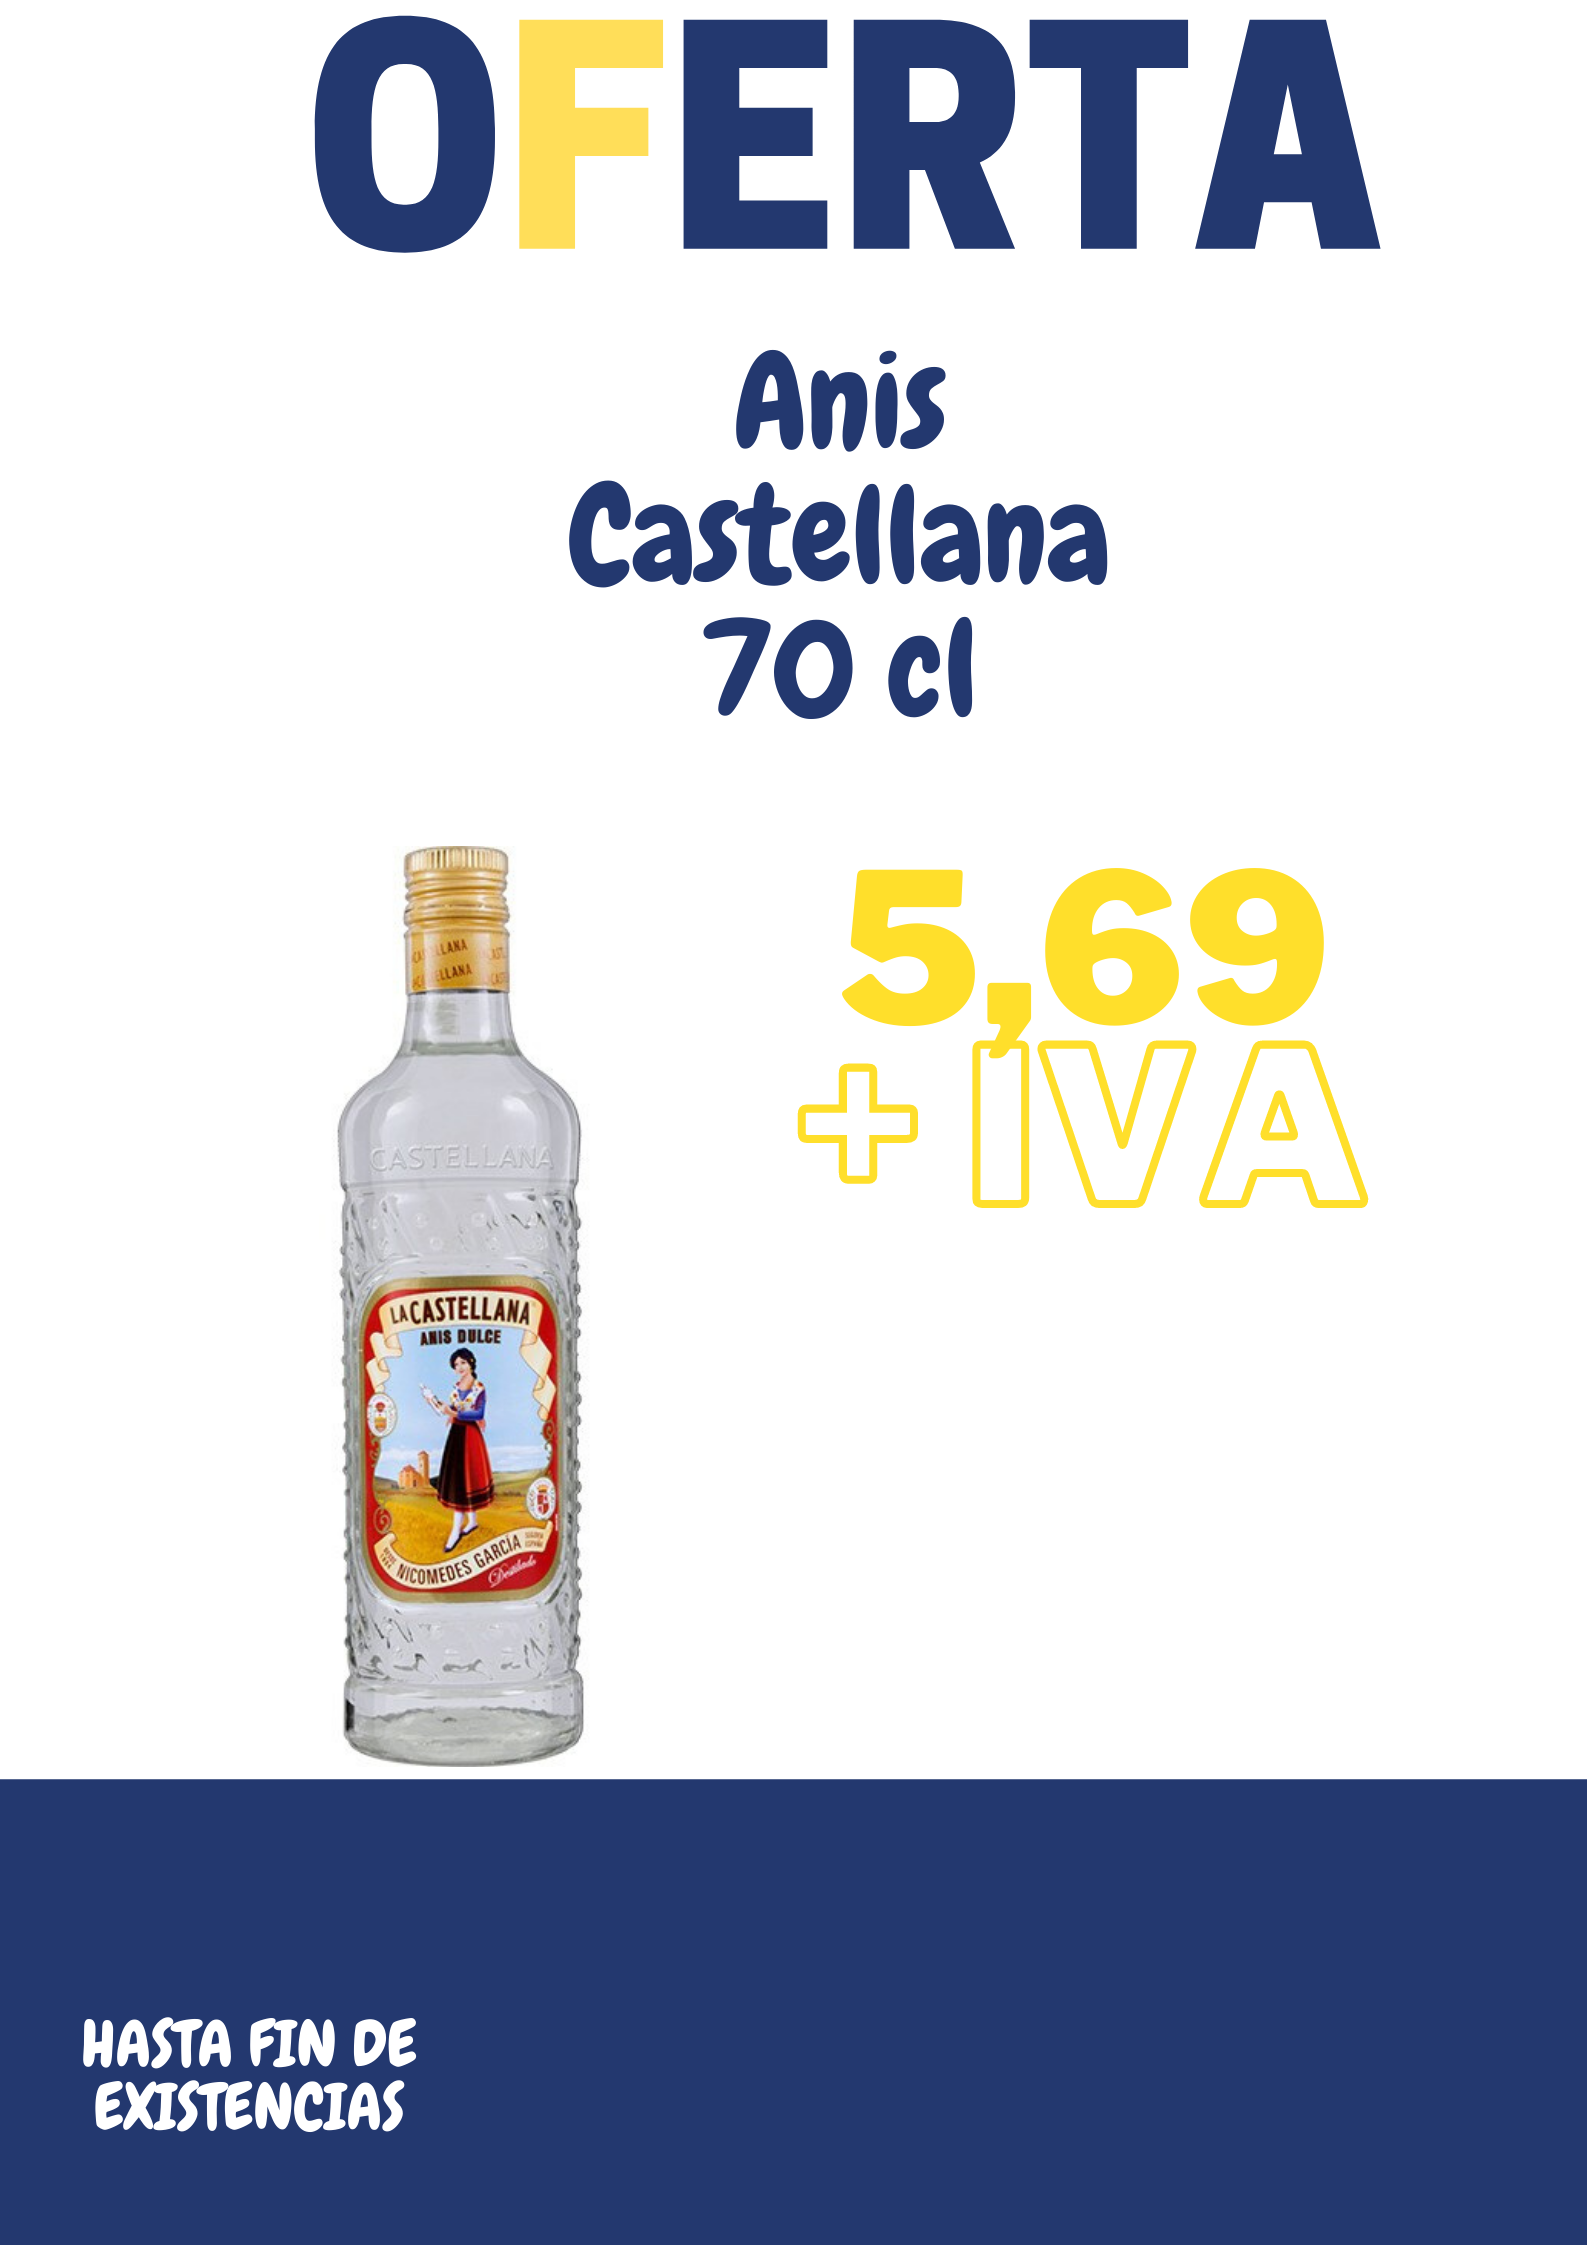 Oferta Anis castellana